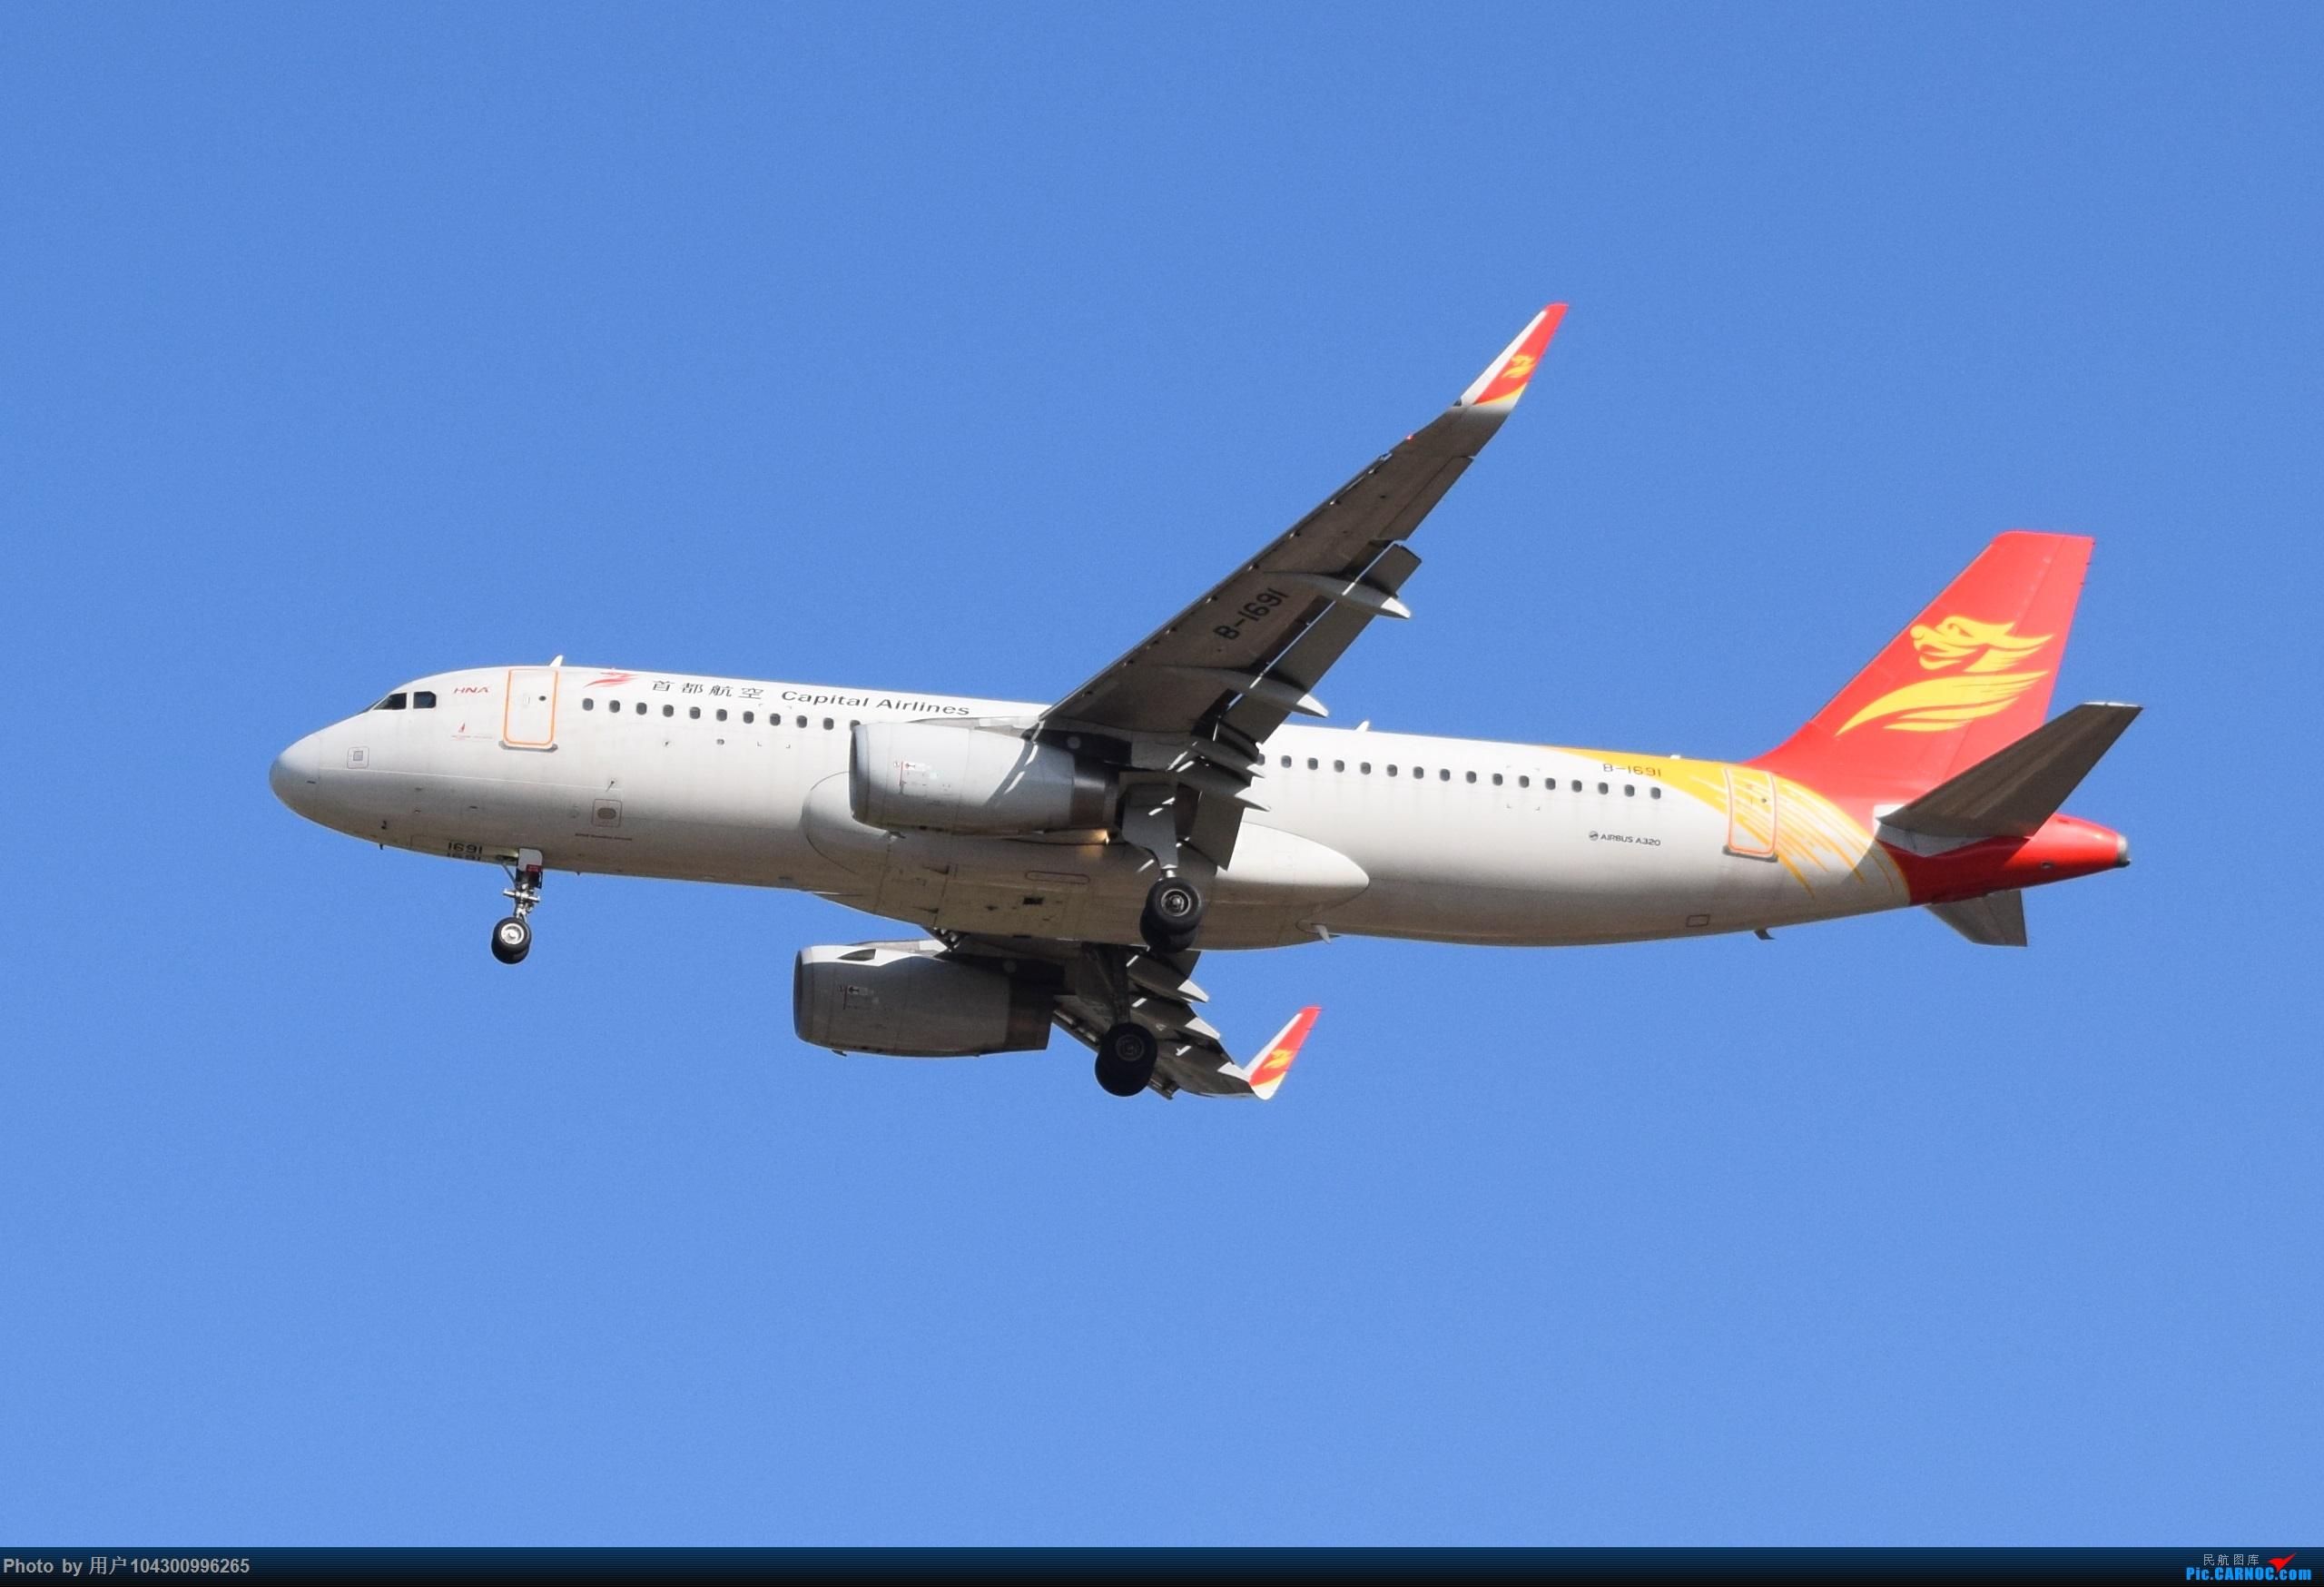 Re:[原创][KWE]贵阳今天天气不错,随便拍几张! AIRBUS A320-200 B-1691 中国贵阳龙洞堡国际机场